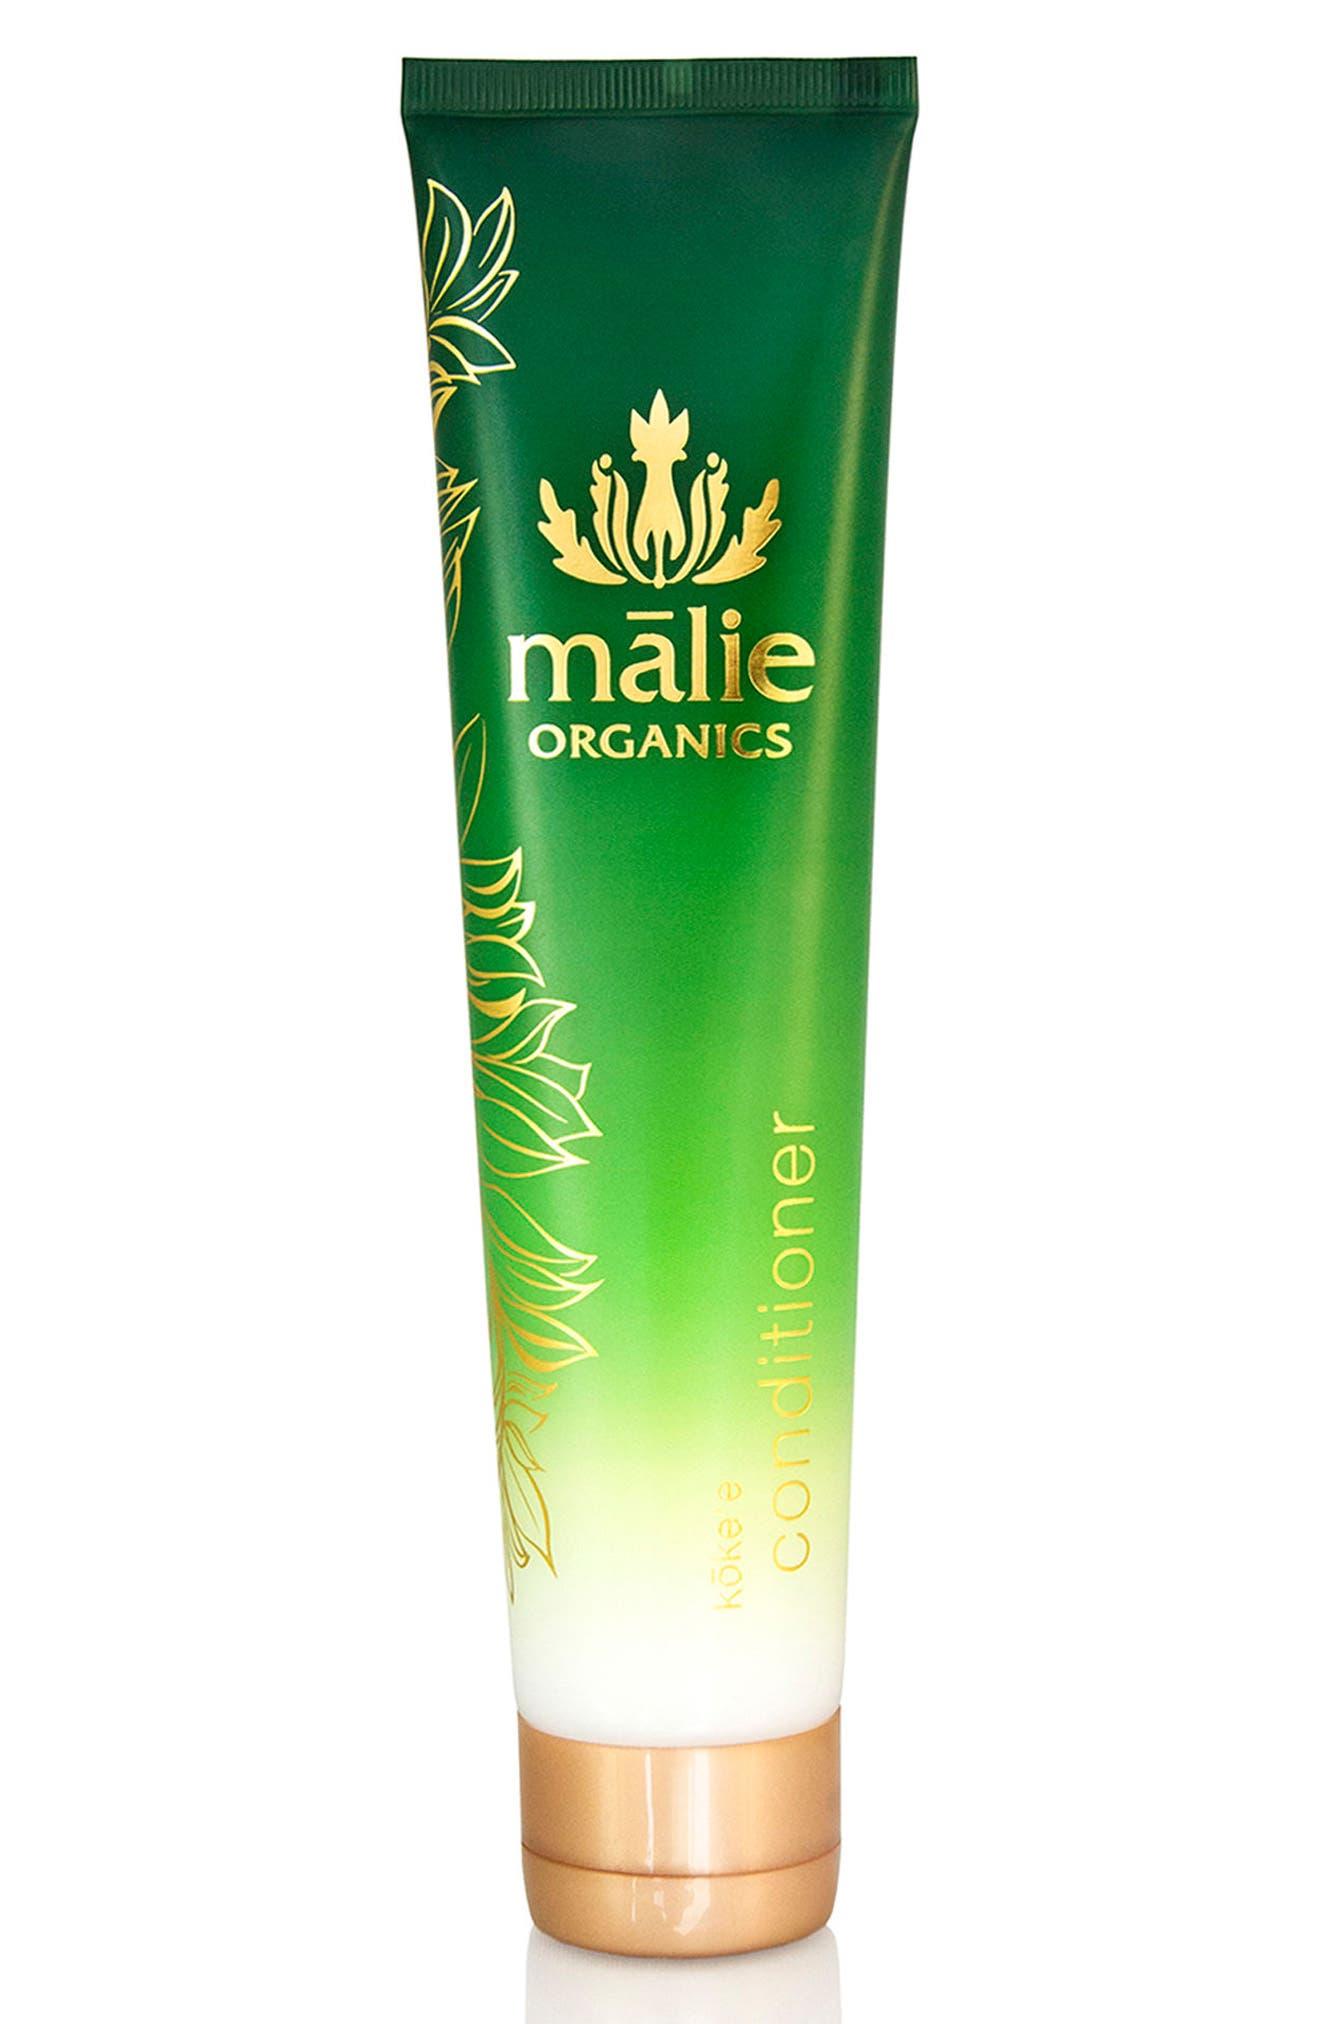 Malie Organics Scented Conditioner